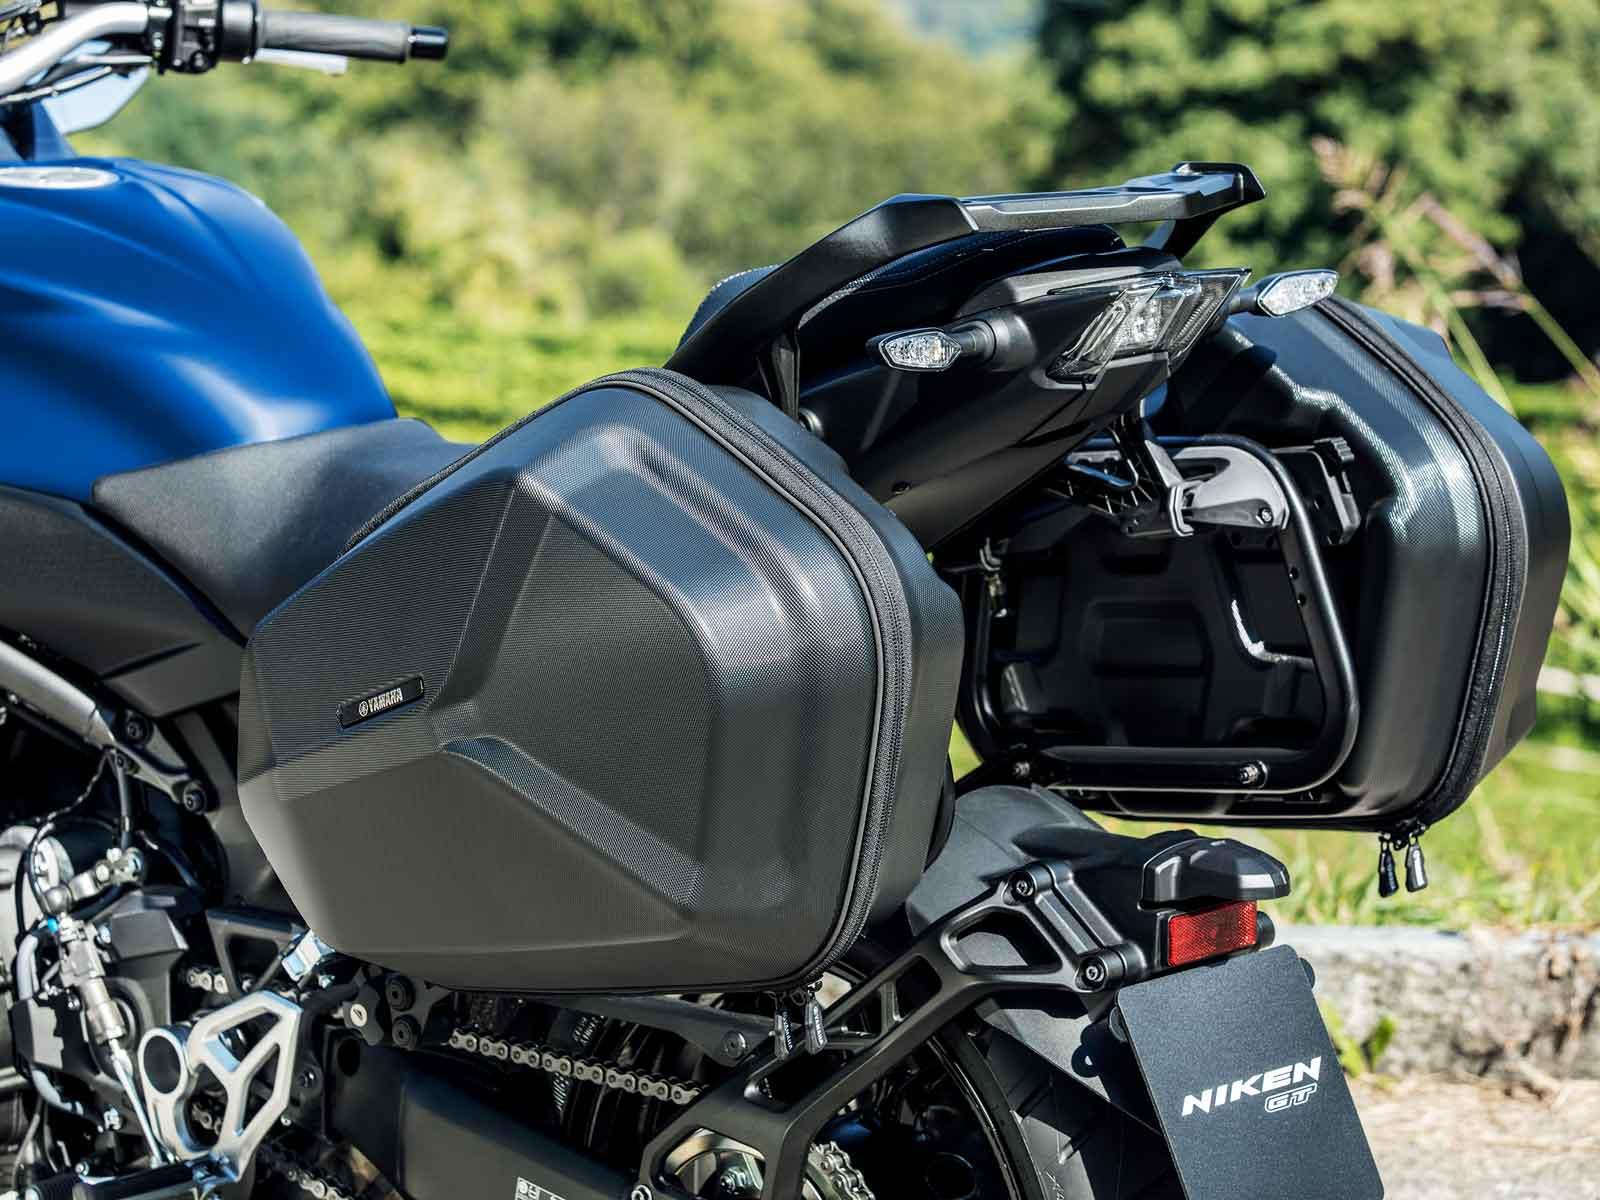 2019 Yamaha Niken Gt Three Wheeler First Look Motorcyclist